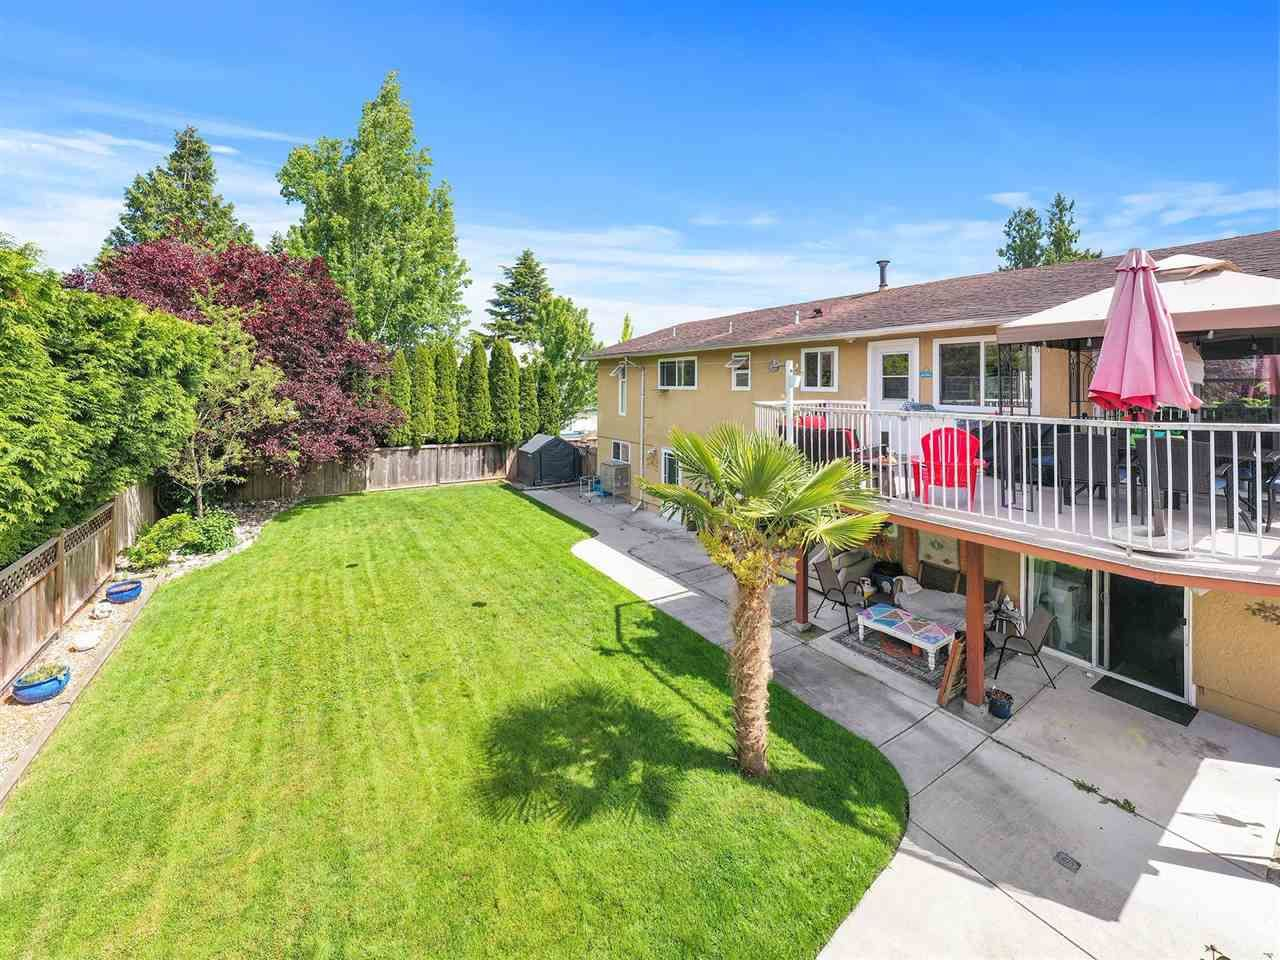 Main Photo: 4943 59 Street in Delta: Hawthorne House for sale (Ladner)  : MLS®# R2587242